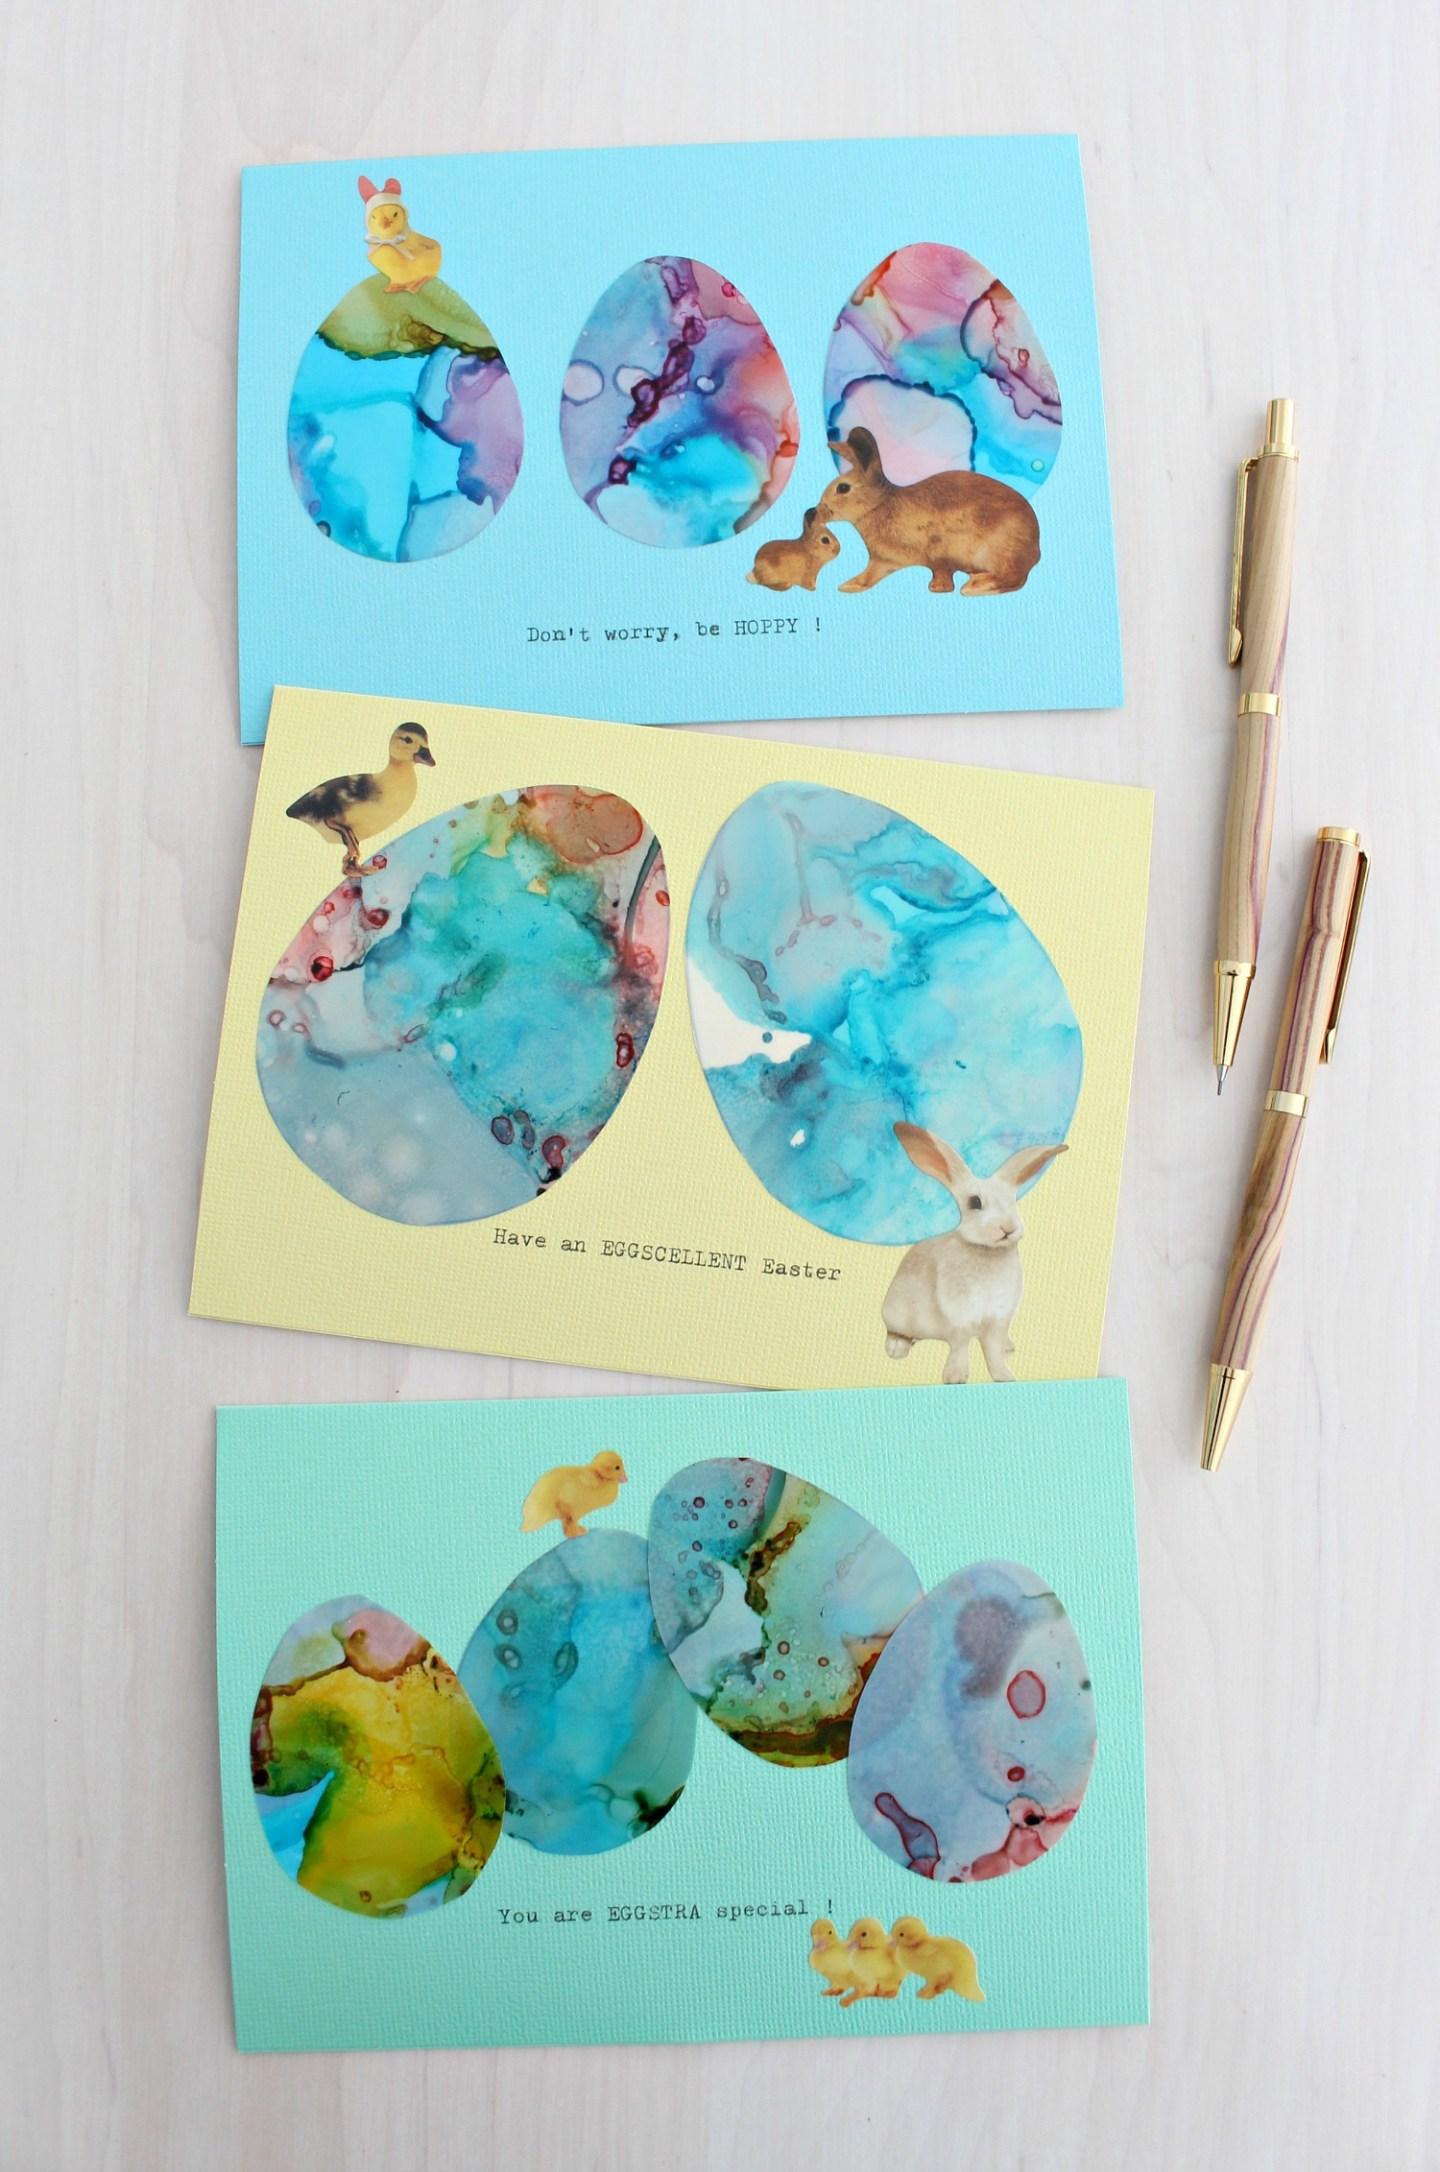 Easter pun cards